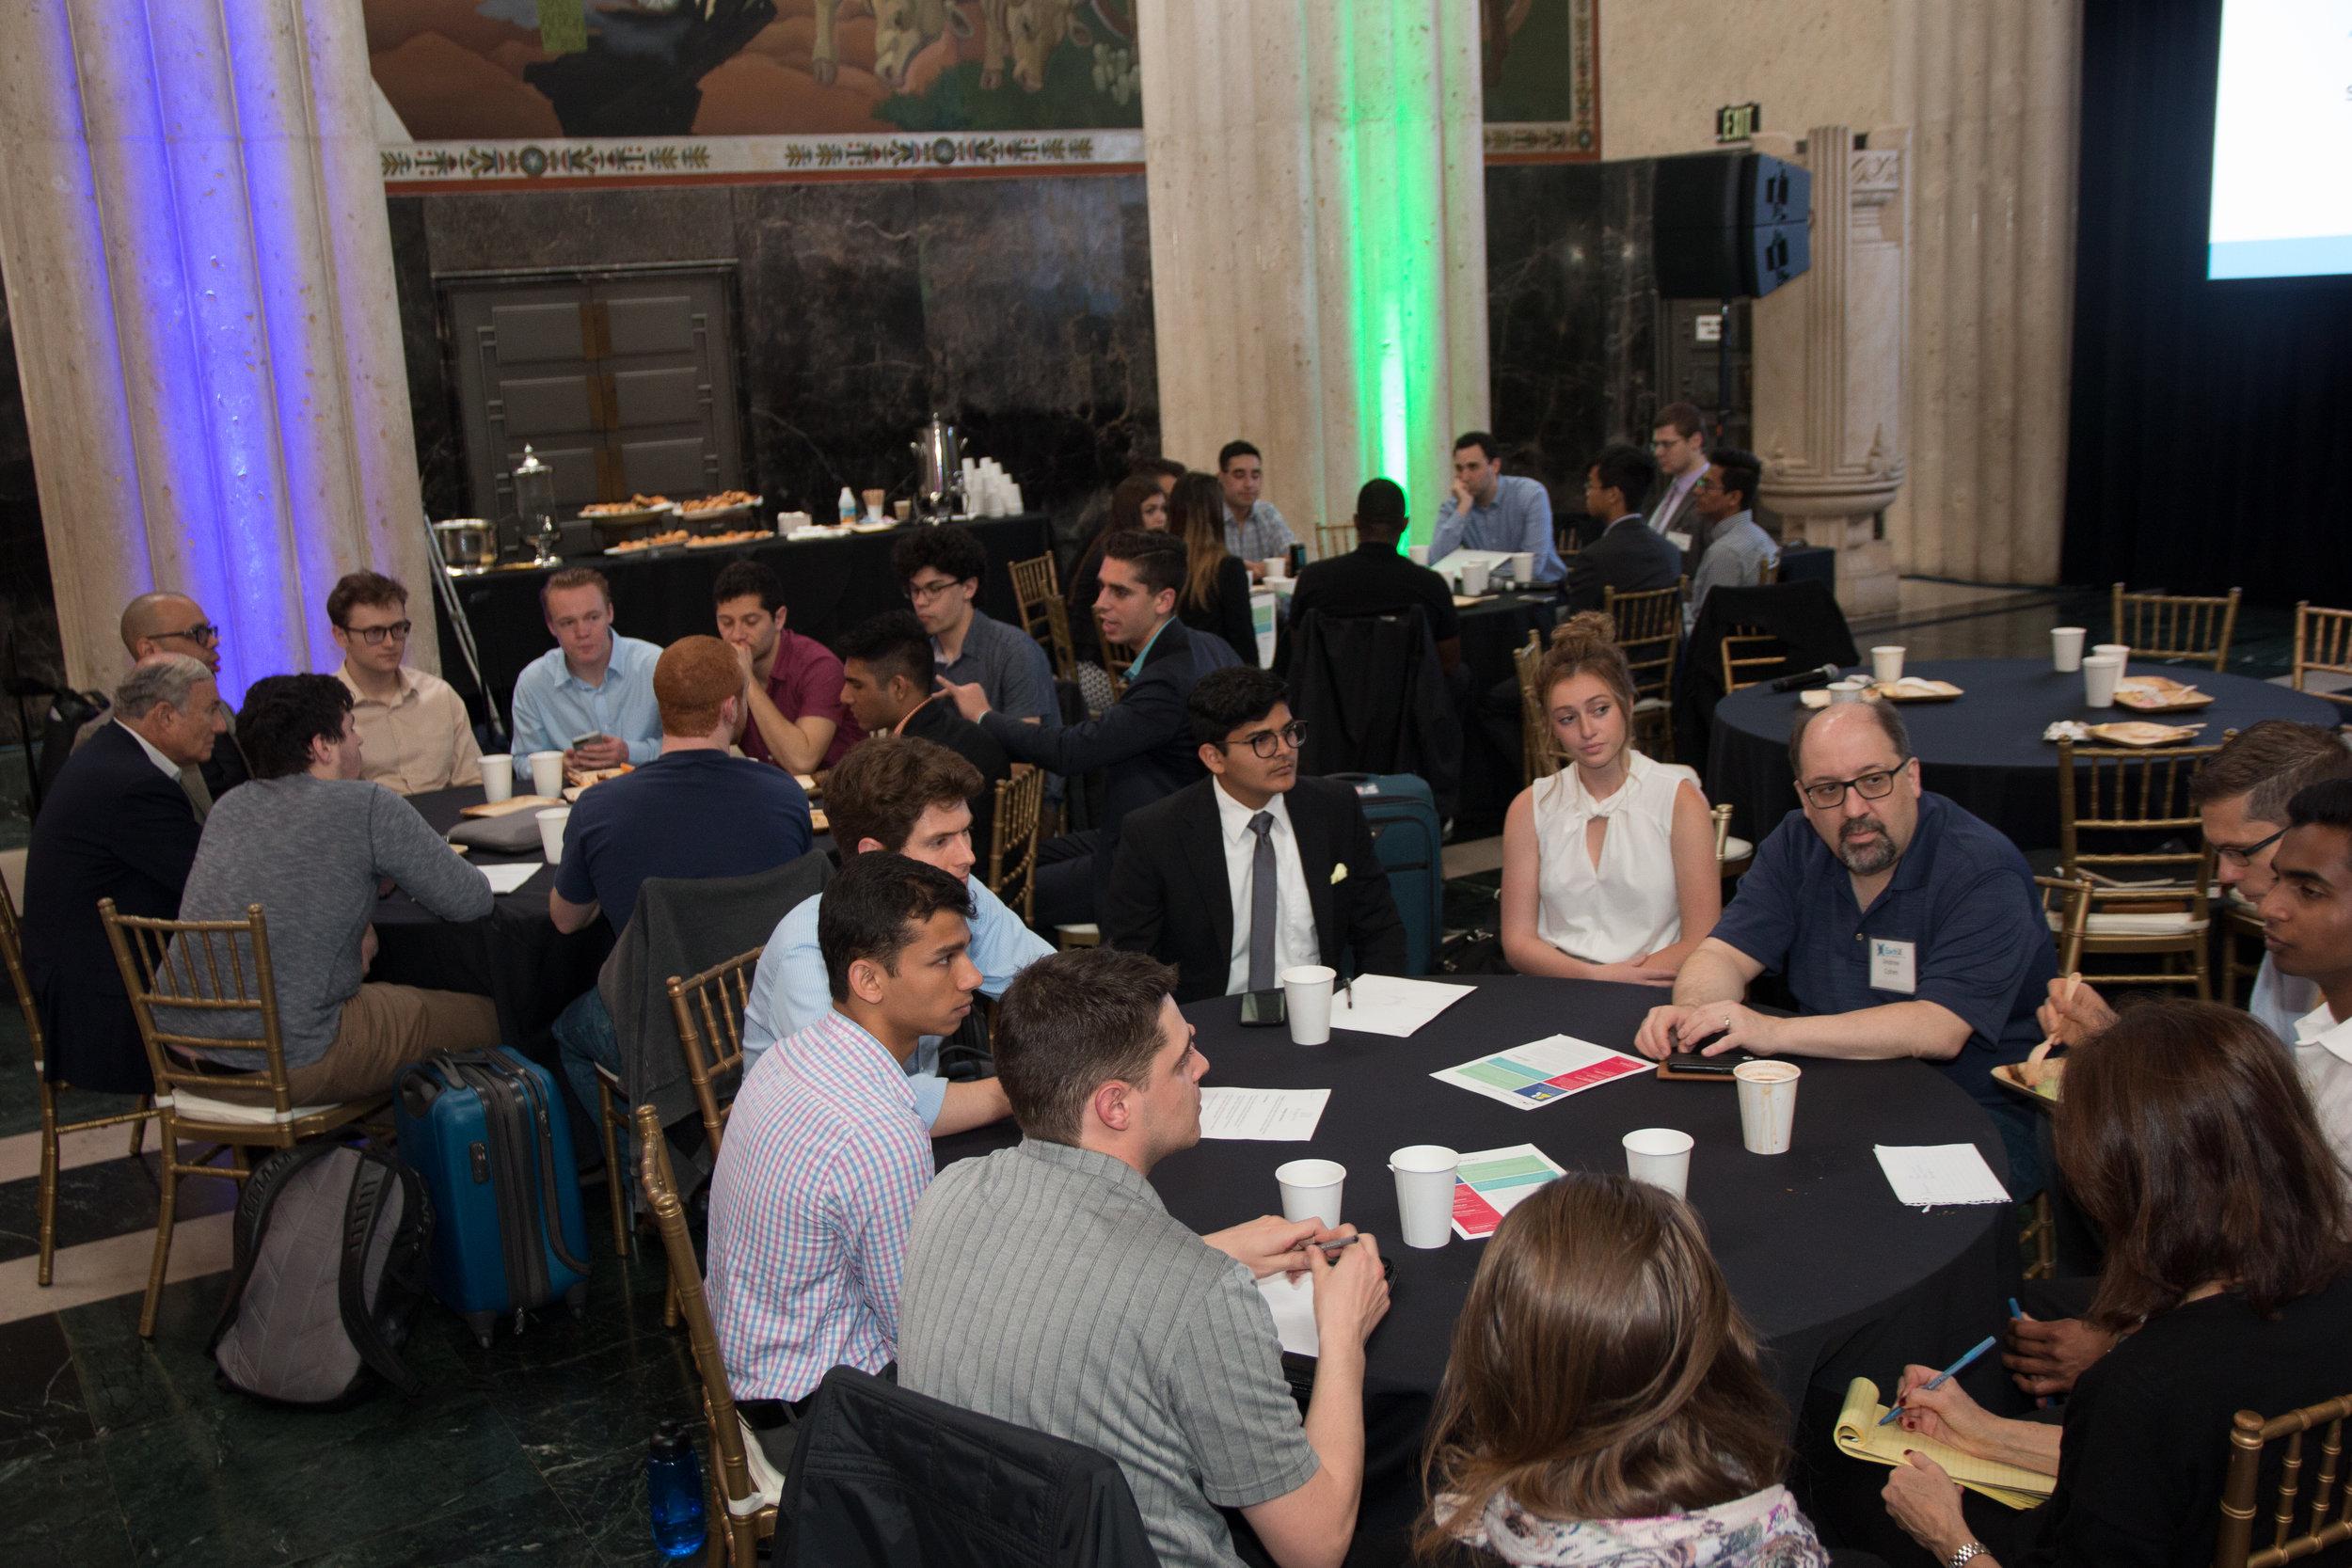 2018-04-22 - EarthX Bridge Summit Conference (JS) 055.jpg